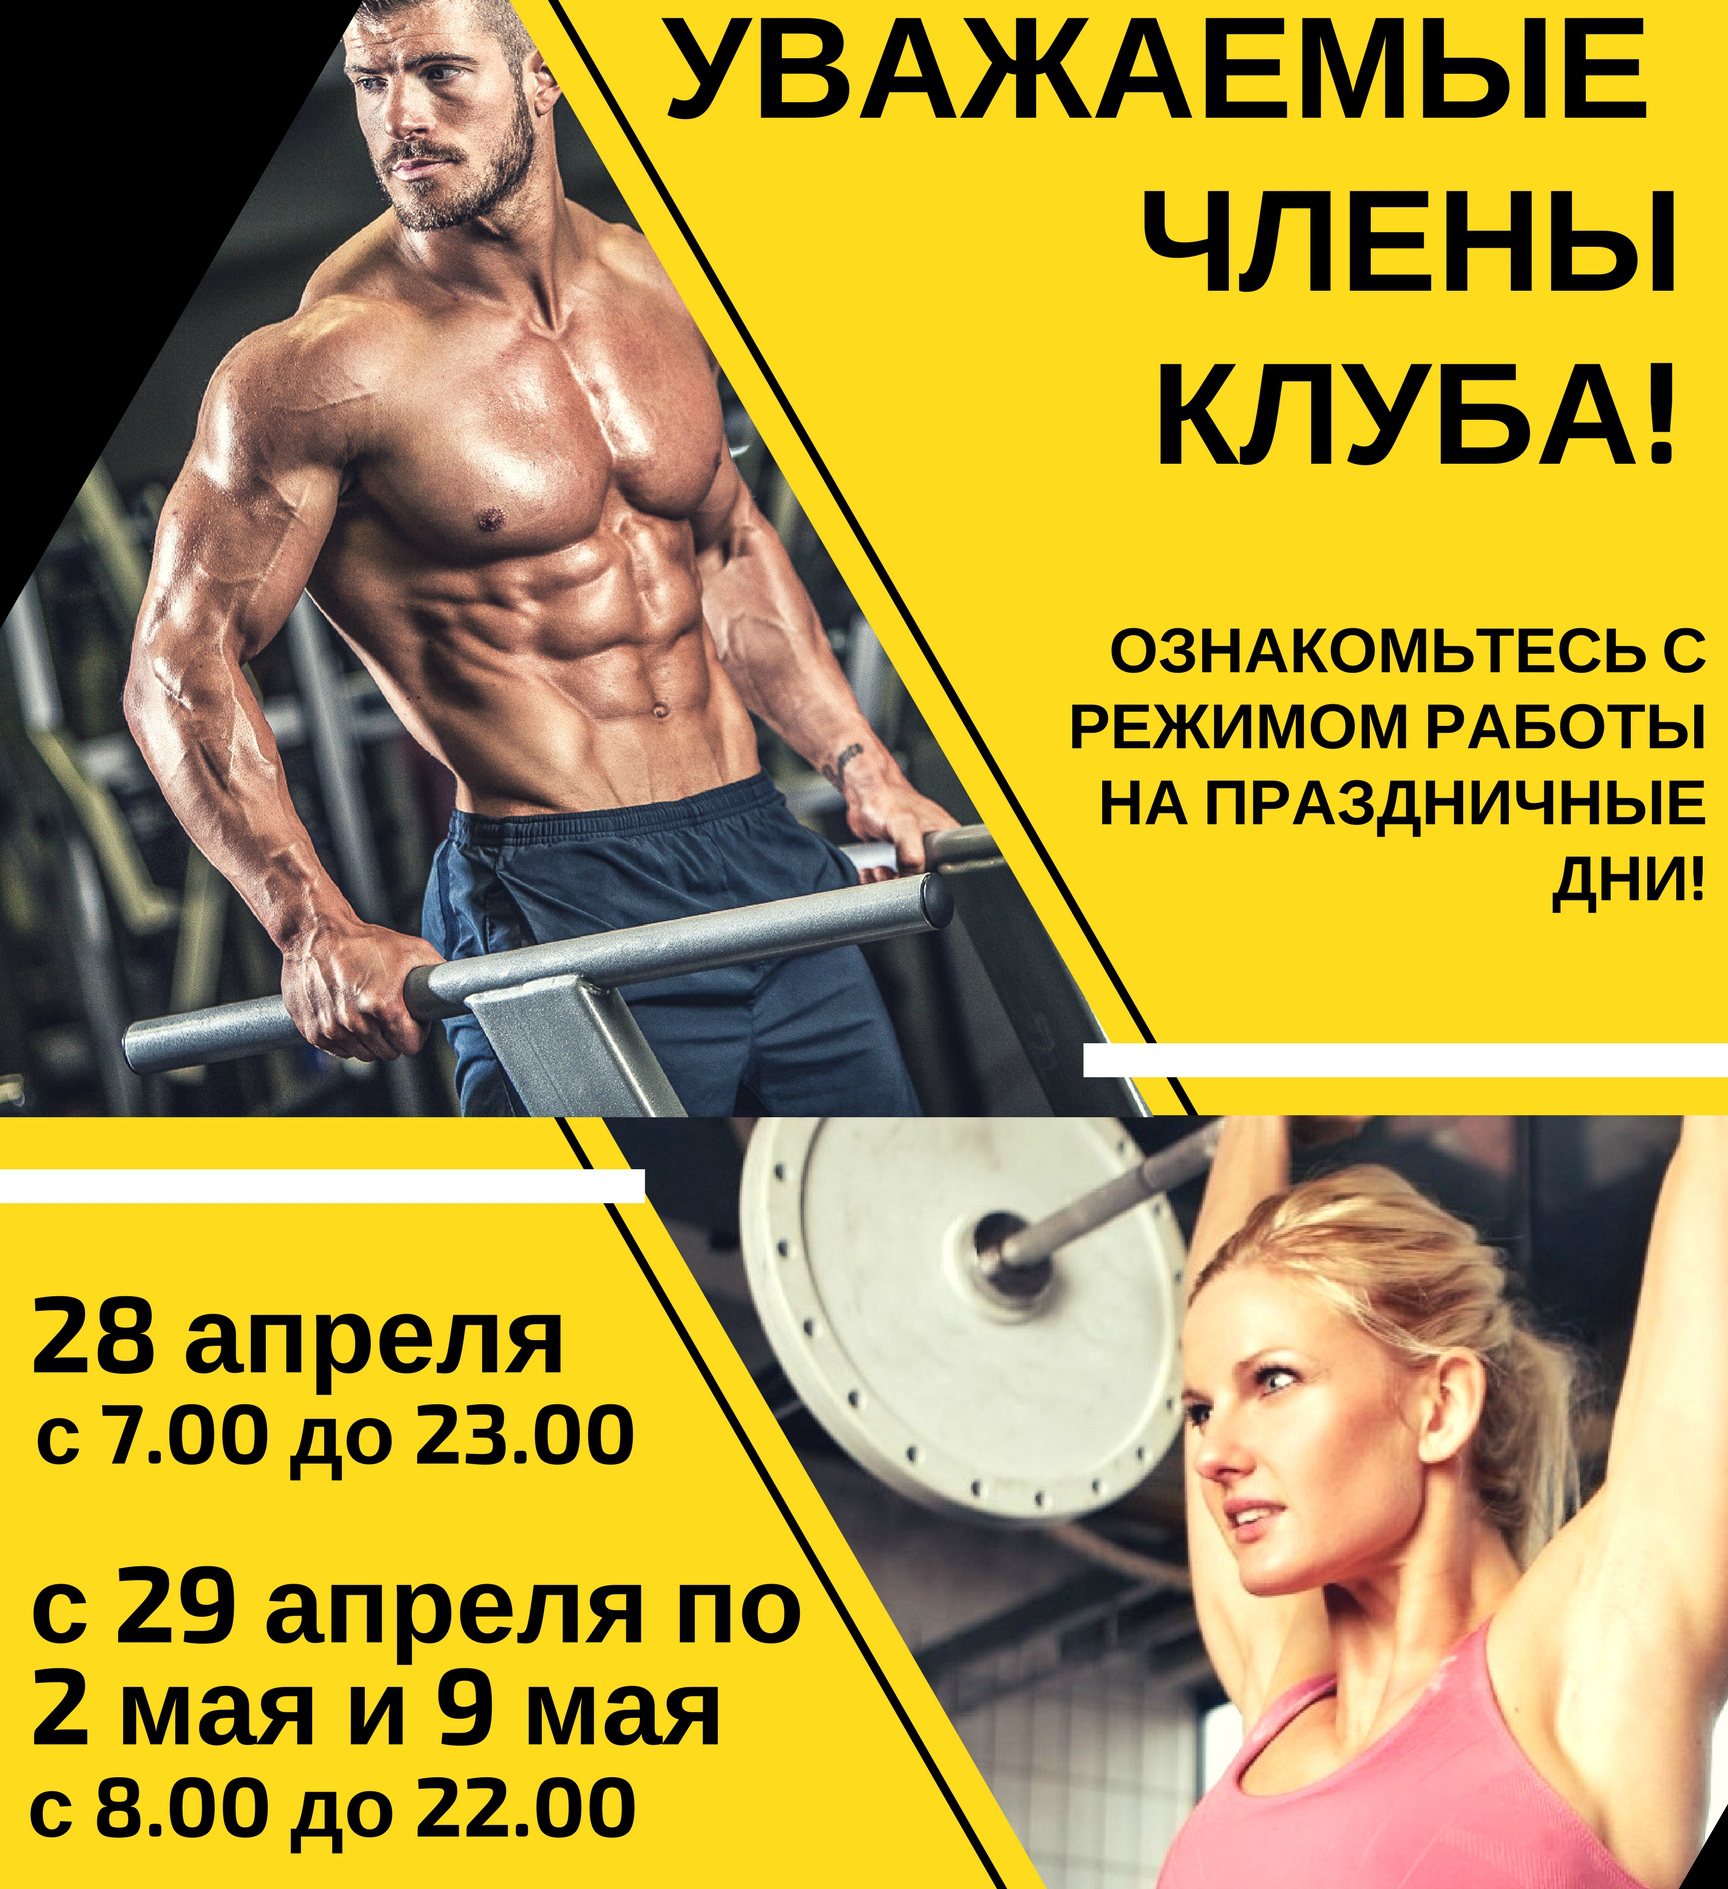 Yellow Cross Elite Gym Poster (1)1 - academic-fitness ru